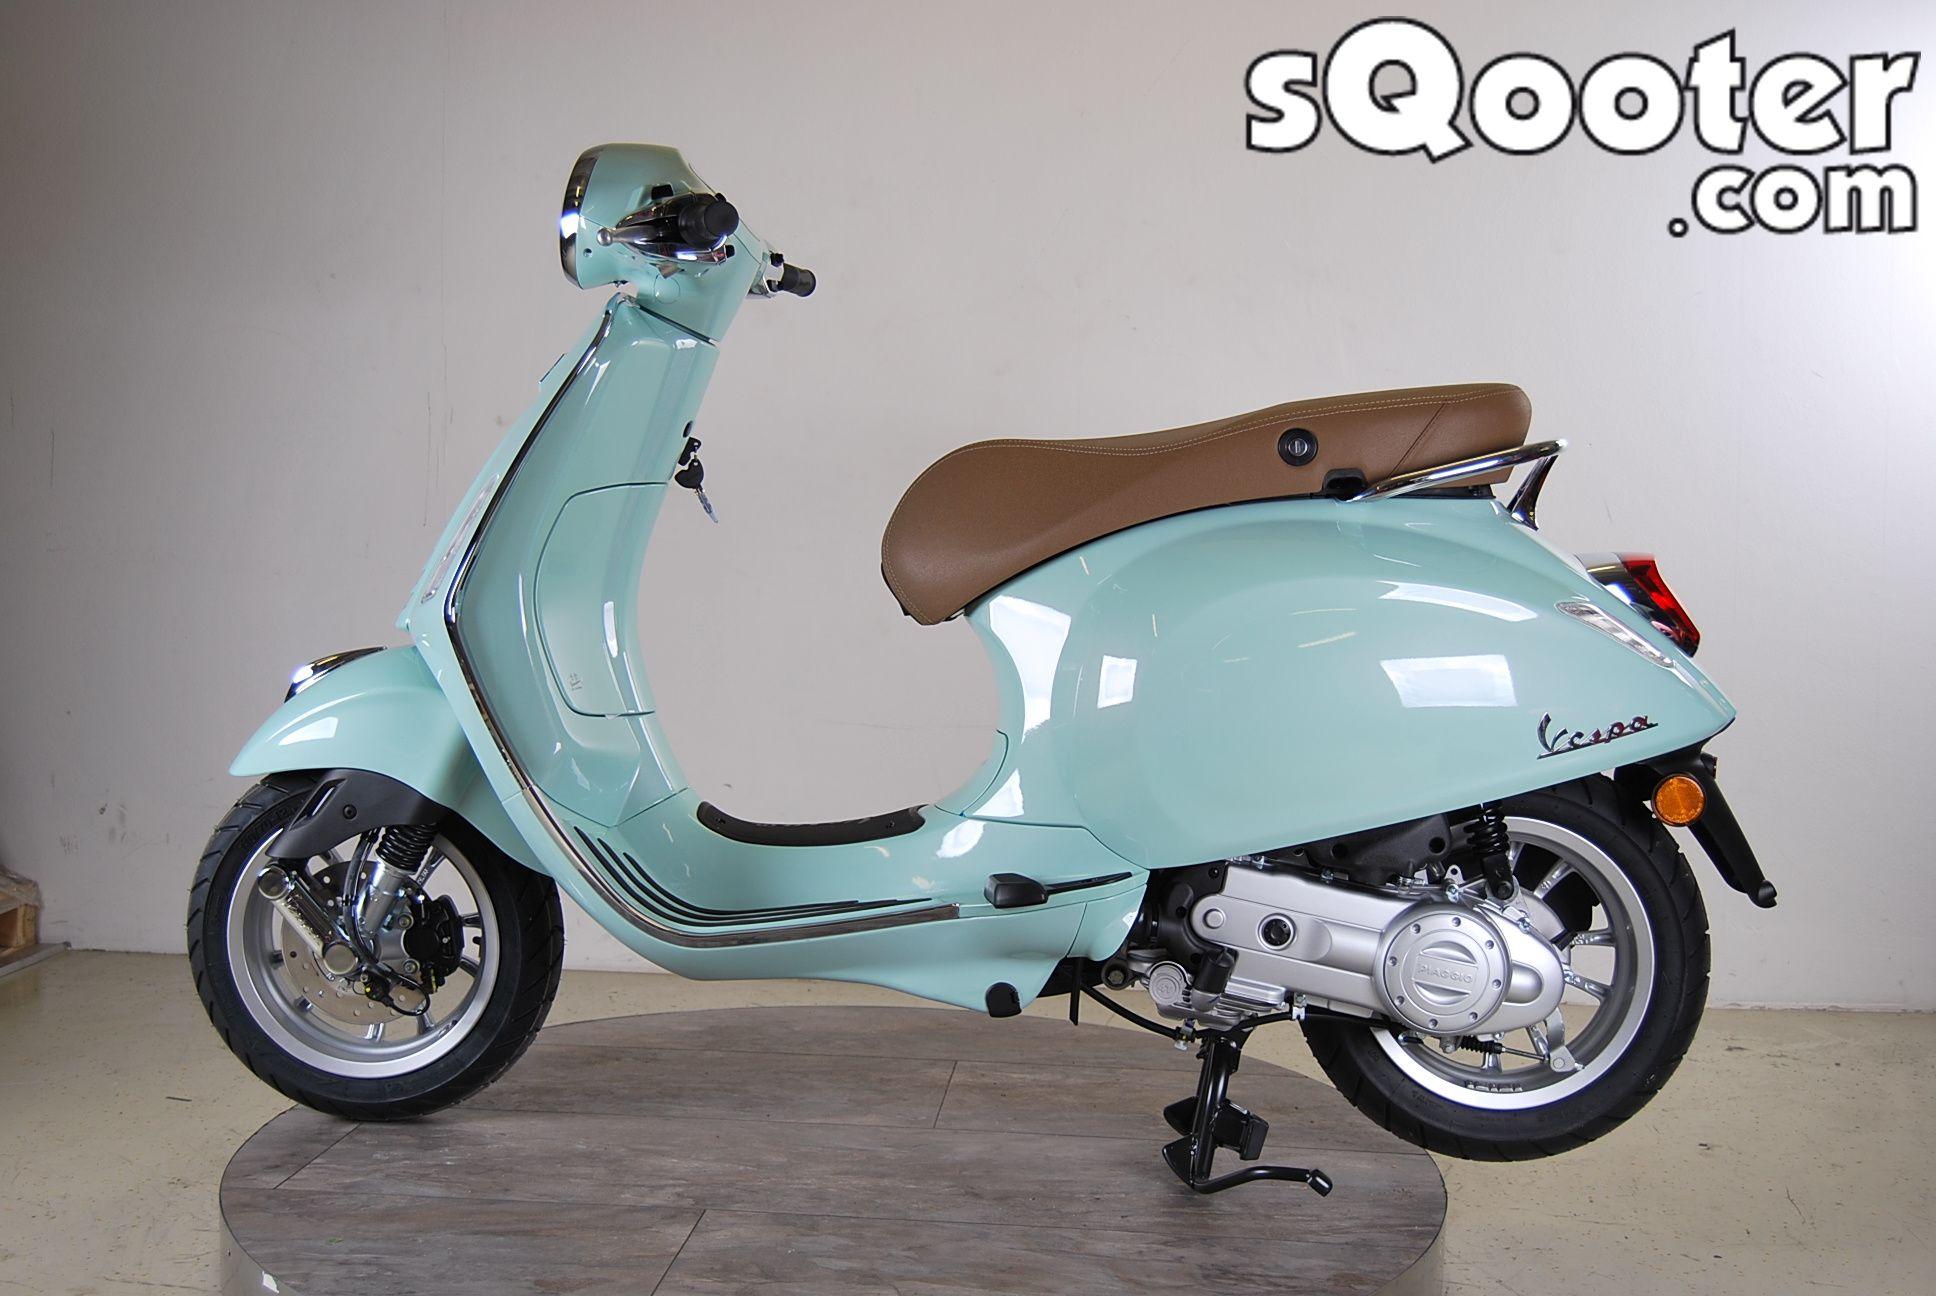 Vespa Sqootercom